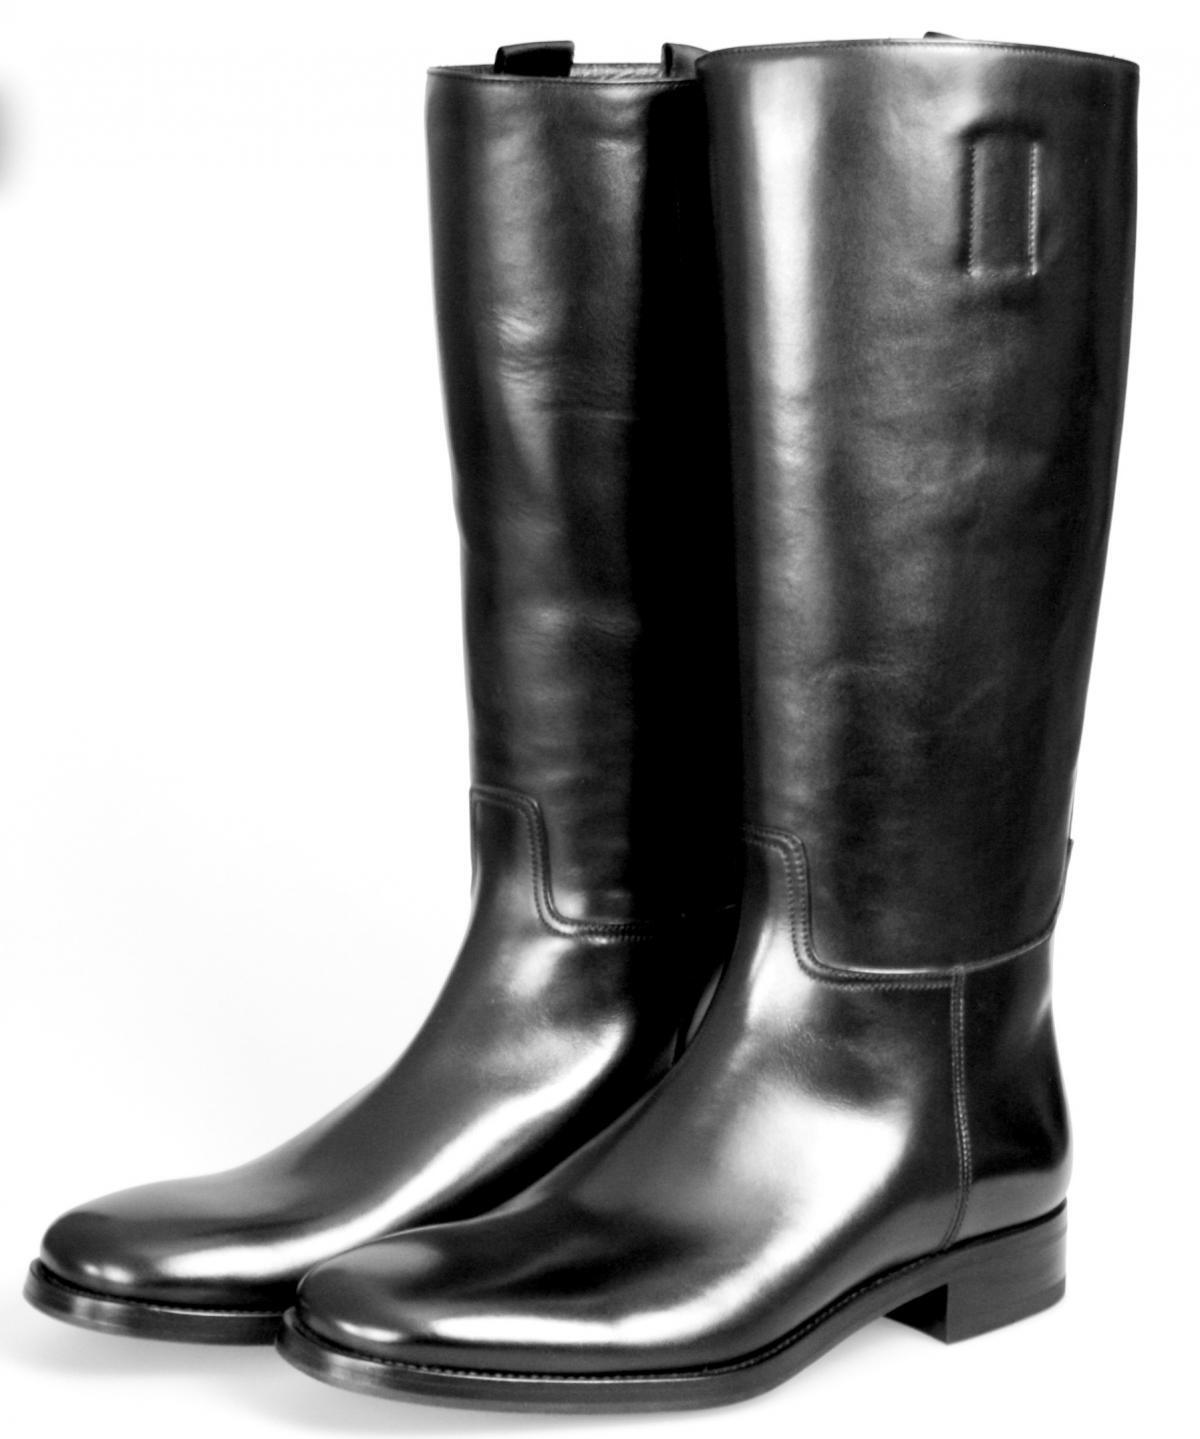 Lujo prada botas clásico 2wa004 negro nuevo New 6 40 40,5